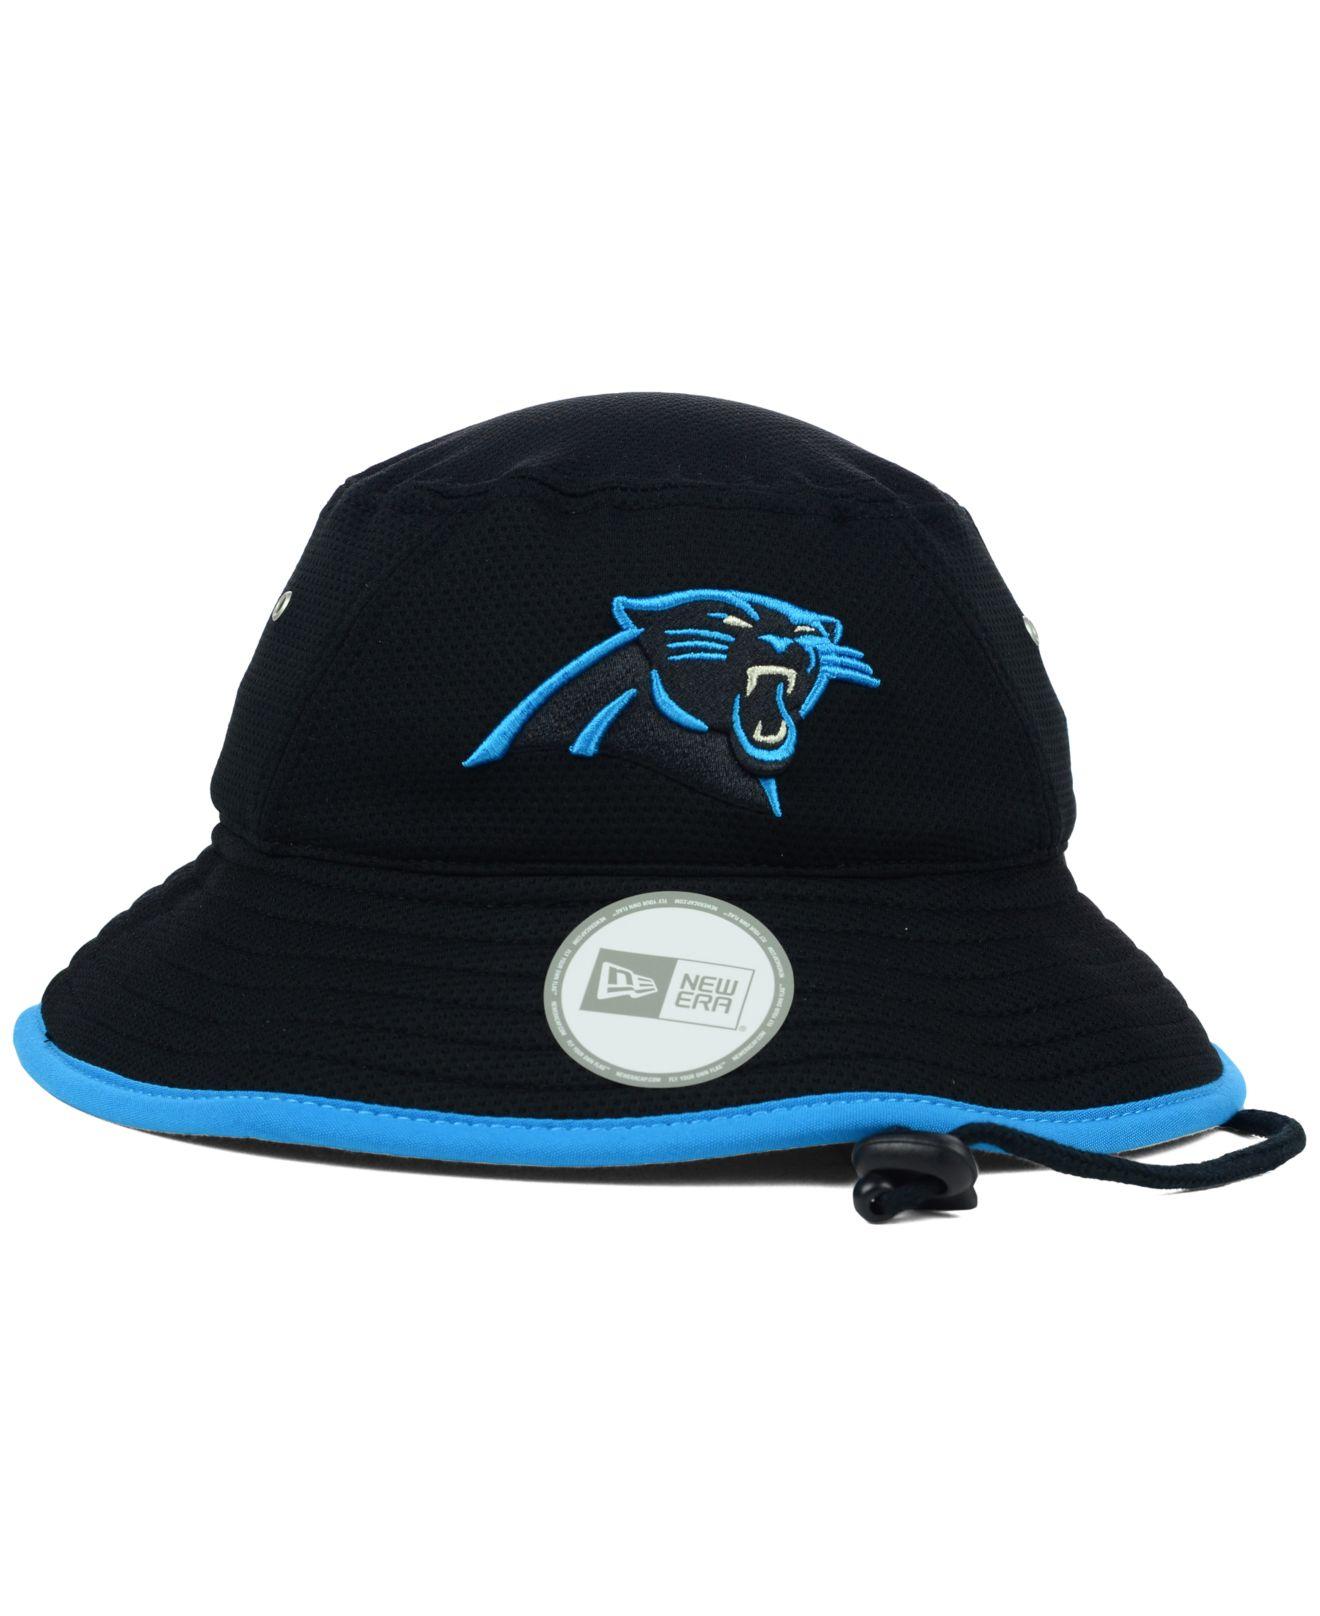 Lyst - KTZ Carolina Panthers Training Bucket Hat in Blue for Men 6e589d8b9